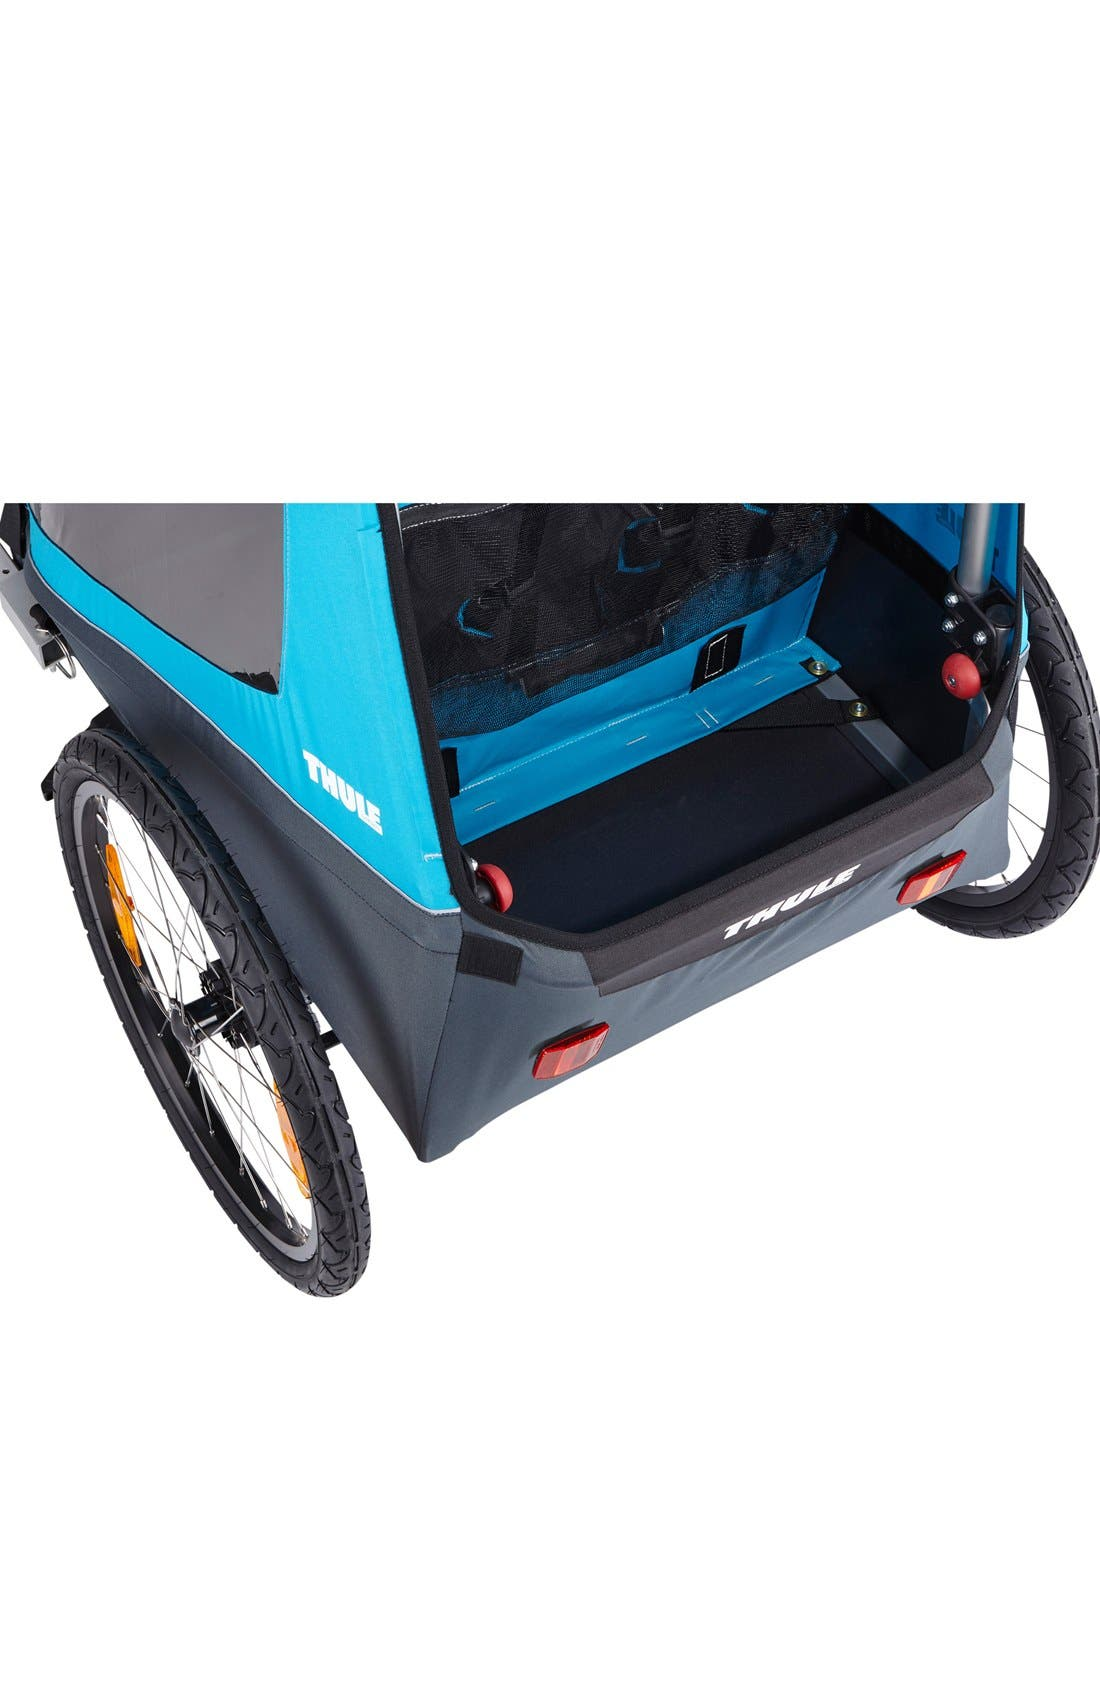 Coaster XT Double Seat Bike Trailer,                             Alternate thumbnail 6, color,                             Blue